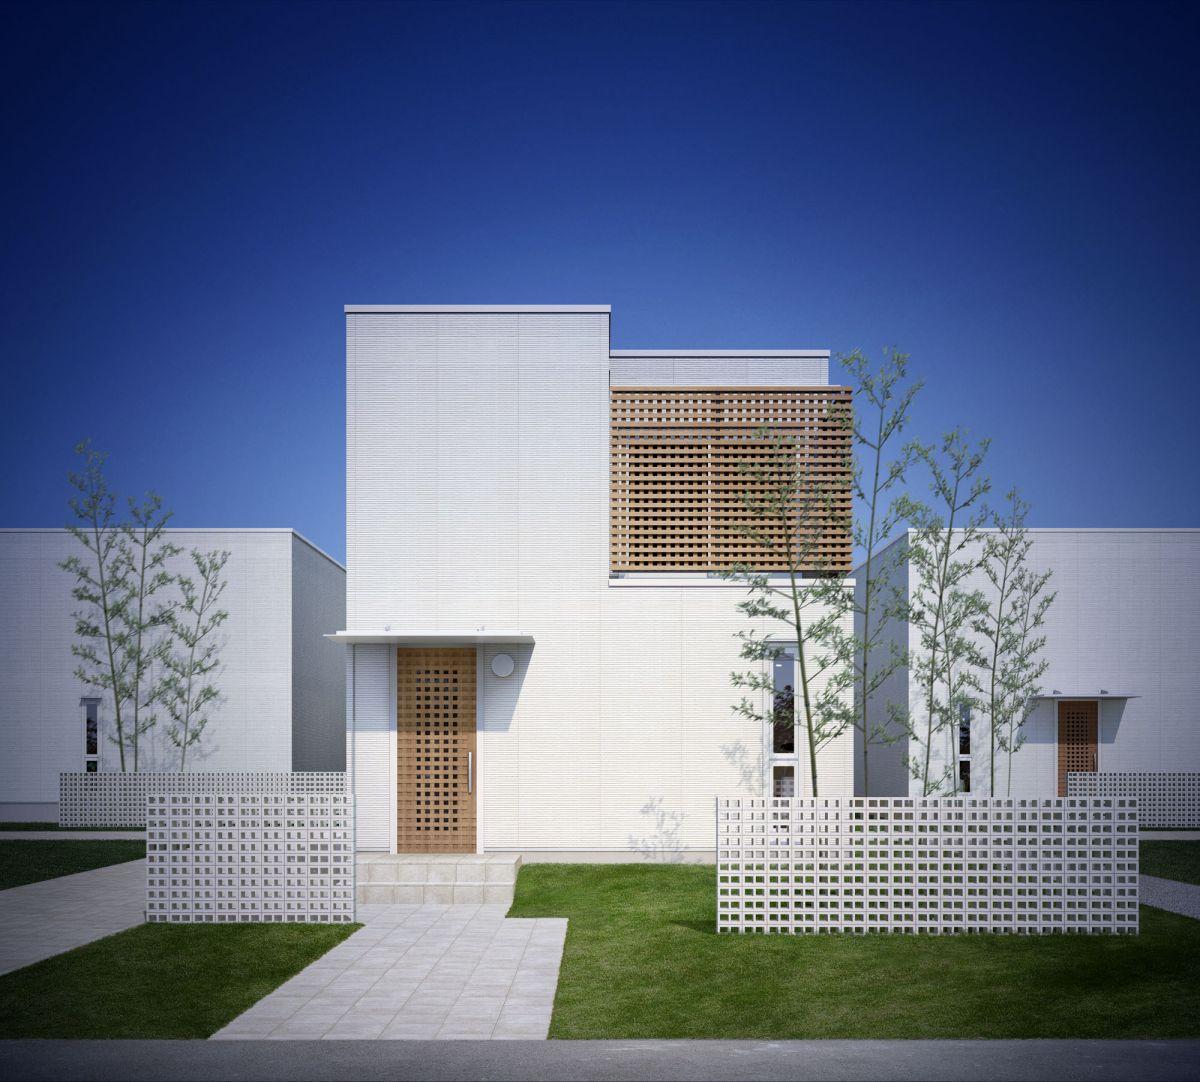 eddis-house-02